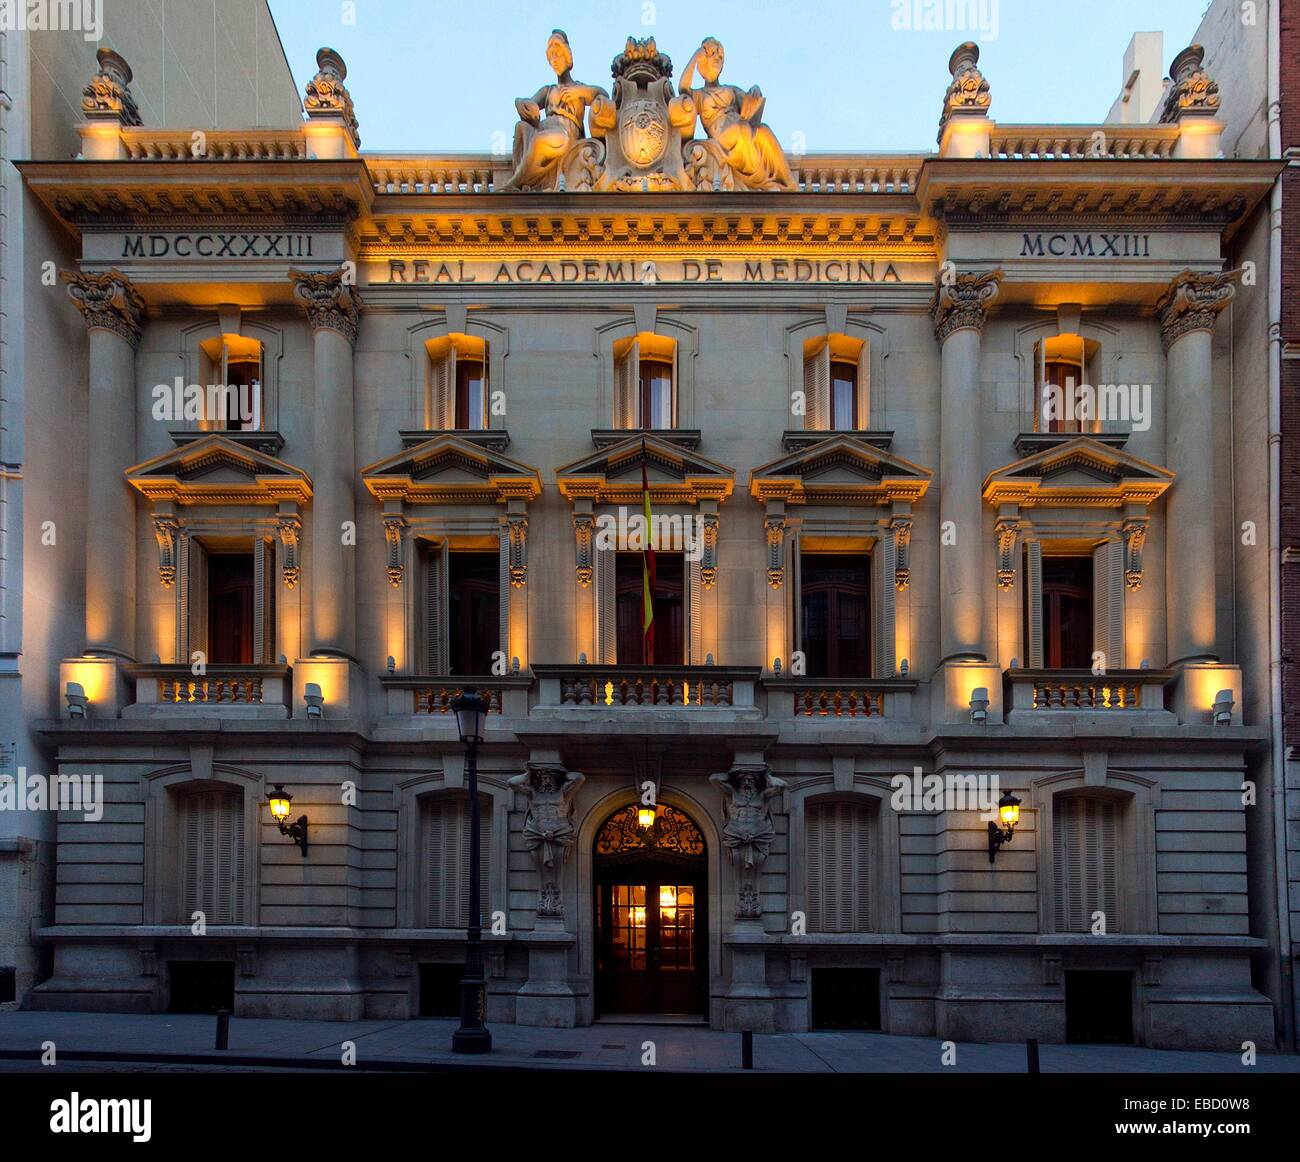 Real Academia Nacional de Medicina, Madrid, Spain Stock Photo